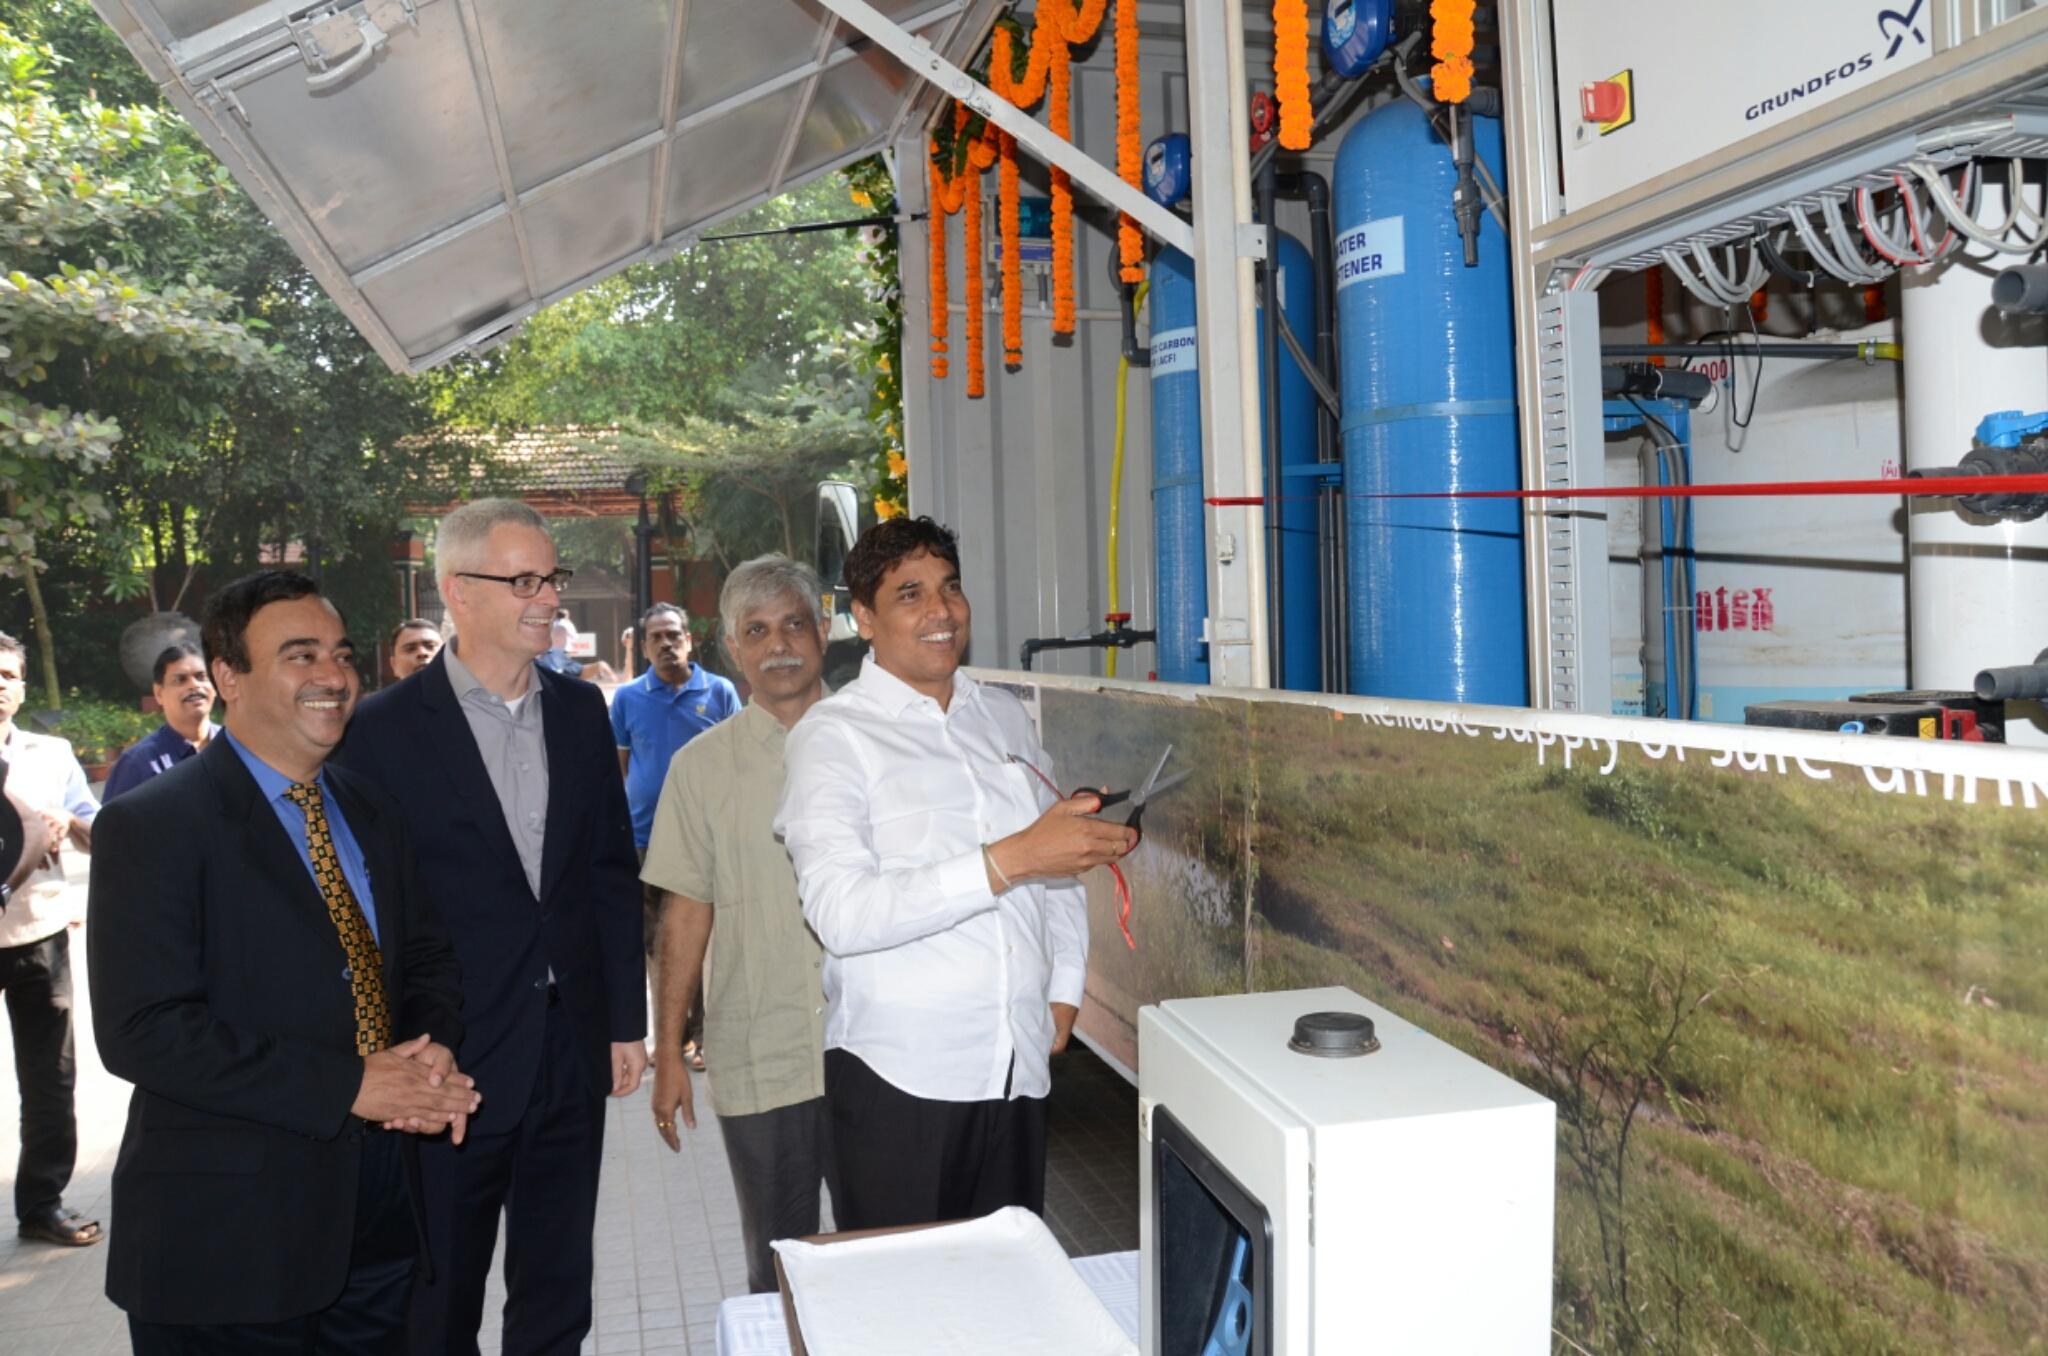 Grundfos & eKutir launch their Unique Mobile Water Purification